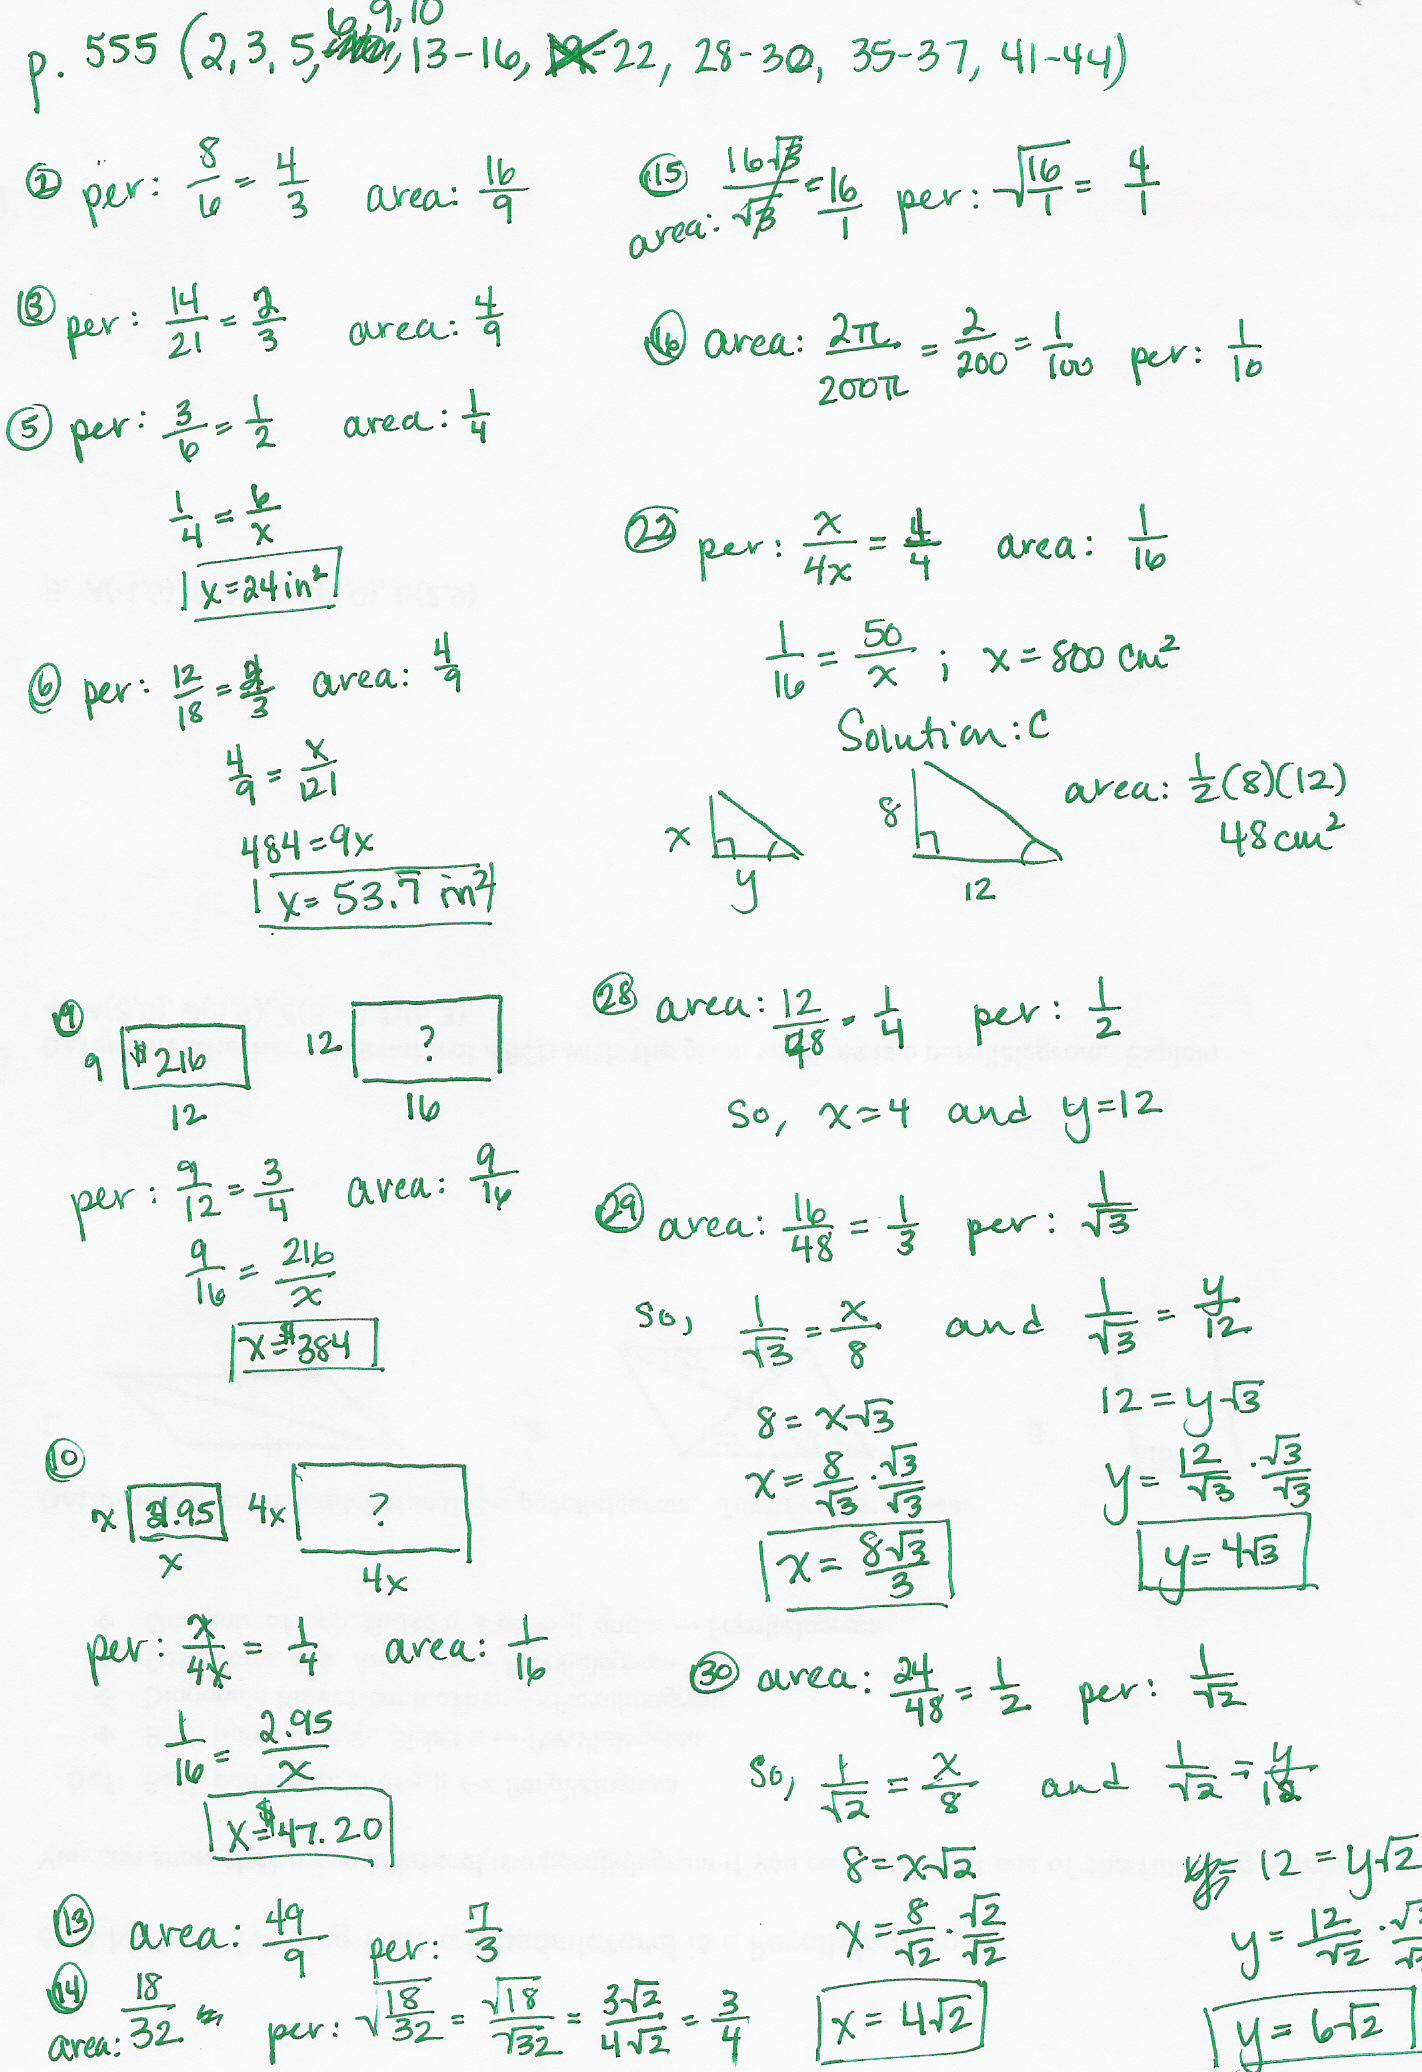 Pe Rs Educ Ti Geometry W Ksheet Nswers Free W Ksheets